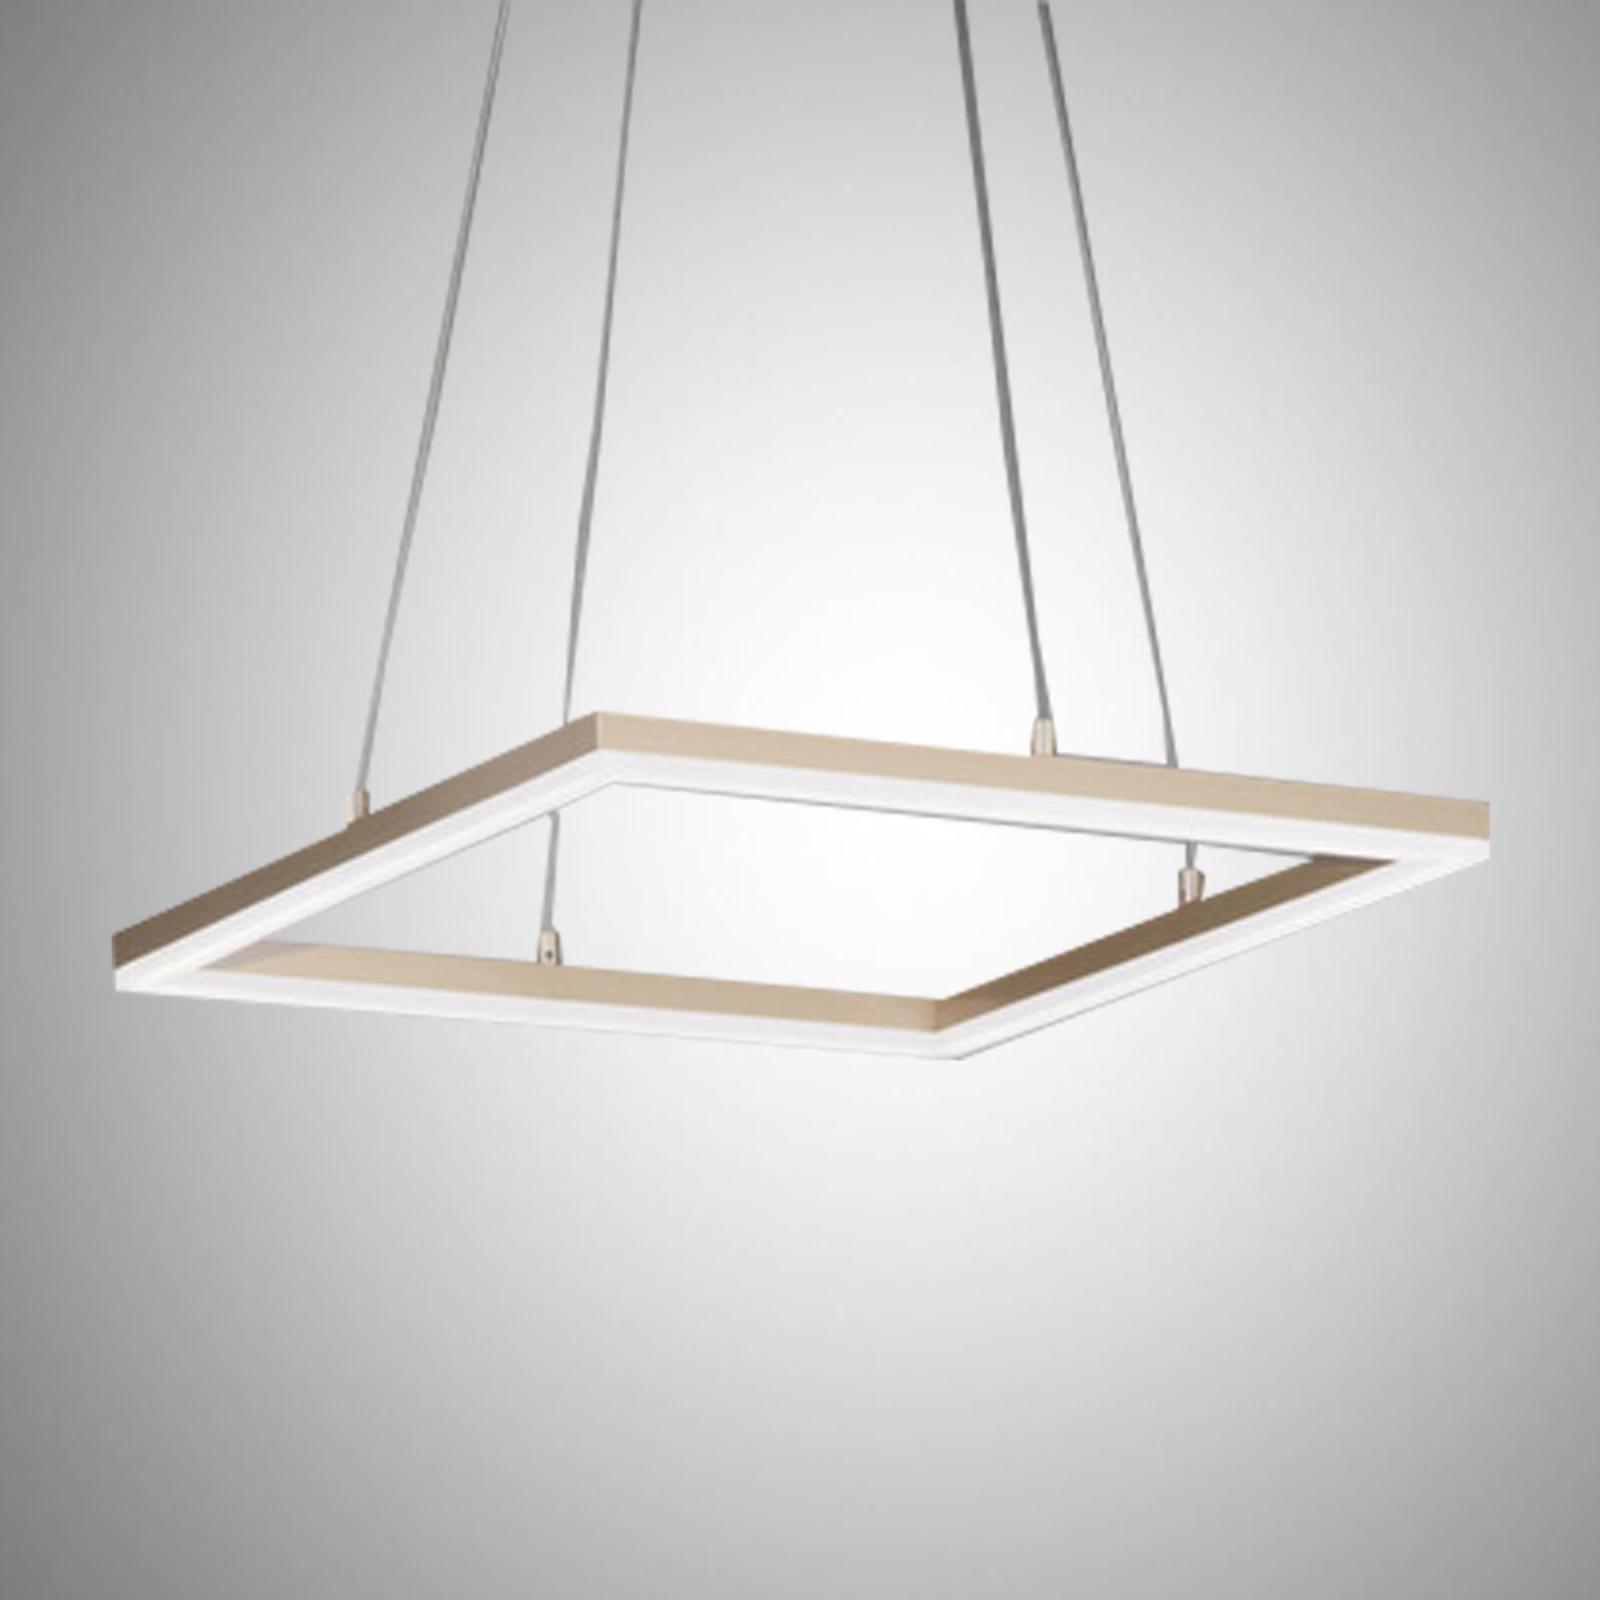 LED-Pendelleuchte Bard, 42x42cm in Mattgold-Finish